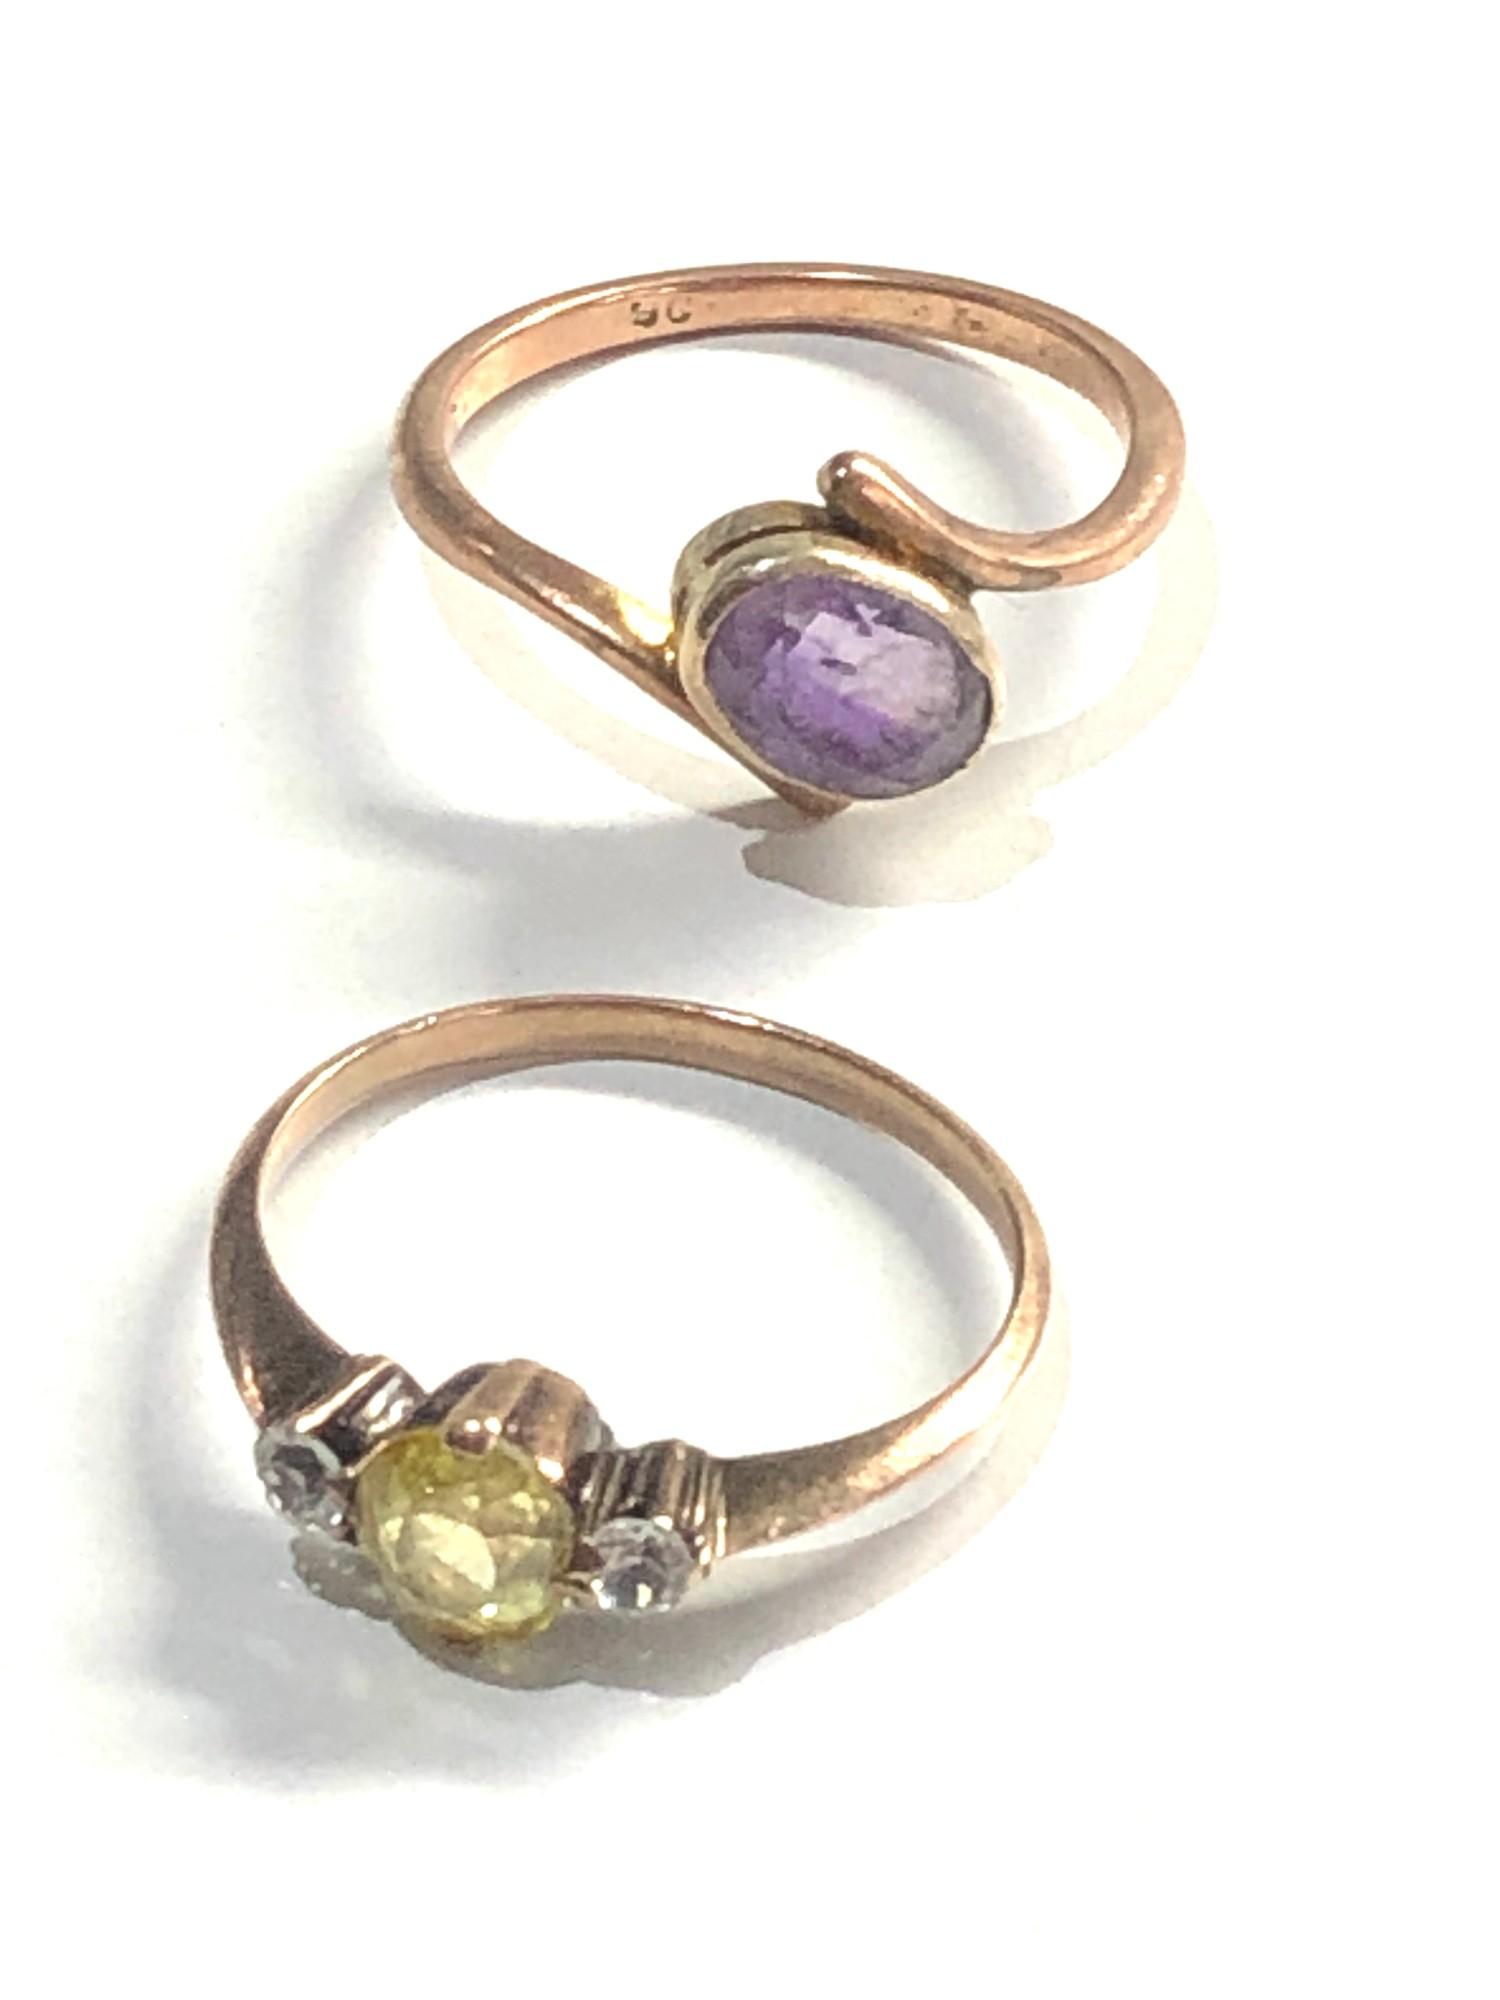 2 x 9ct Gold dress rings 3.7g